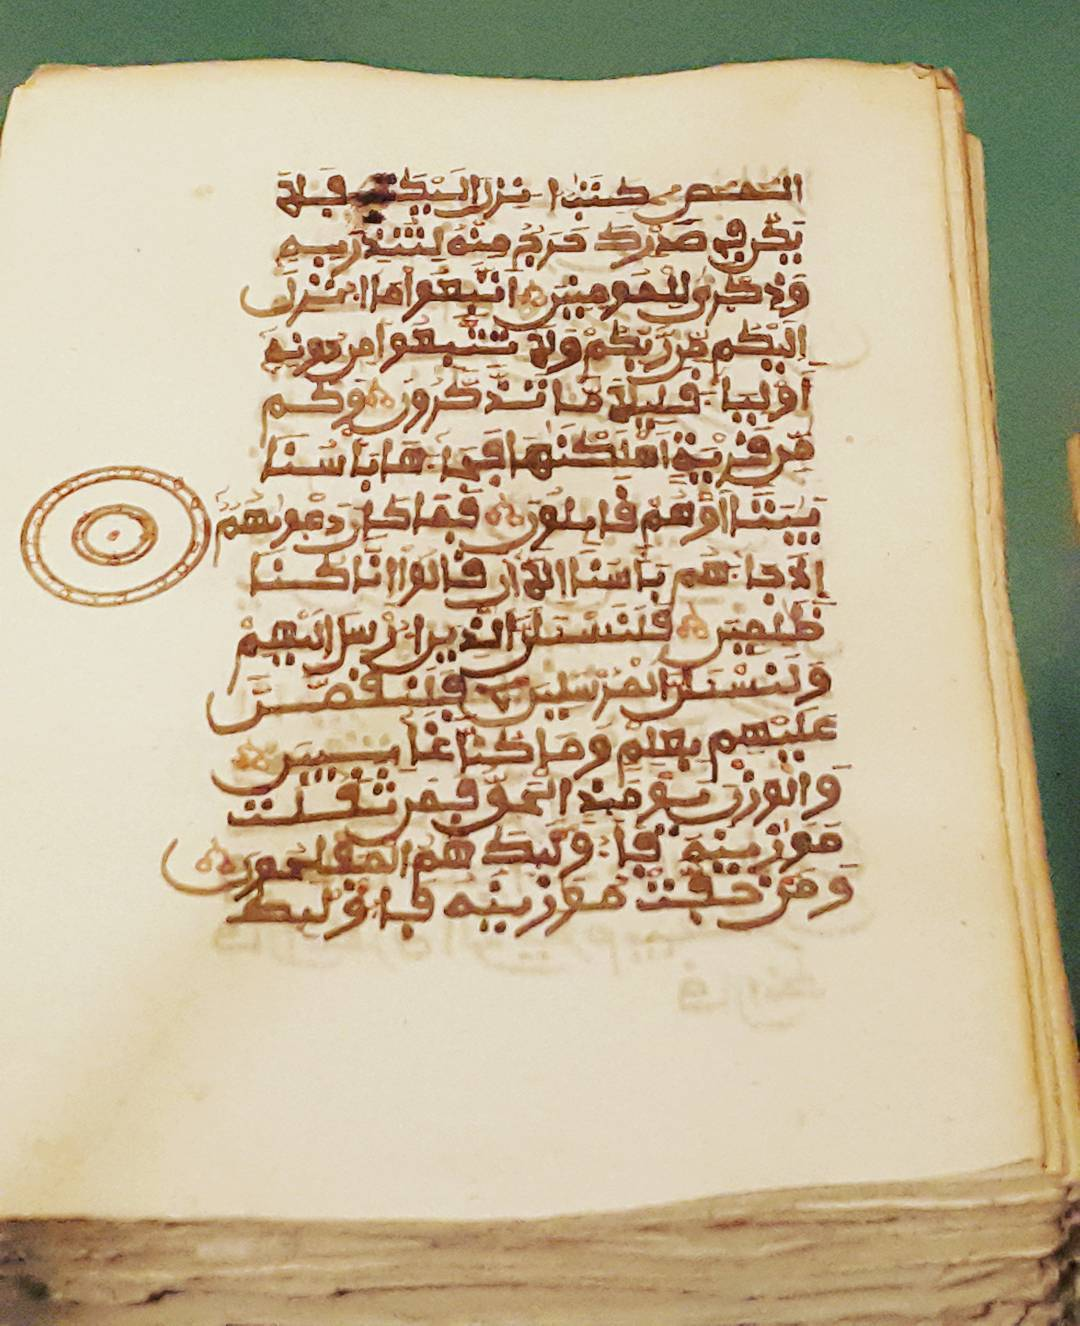 Khat Diwani Ajhalawani/Amr صورة مكبرة لإحدى صفحات القرآن الغير مغلف كتبت ب #الخط_المغربي ب #المتحف_البريطان... 45 1